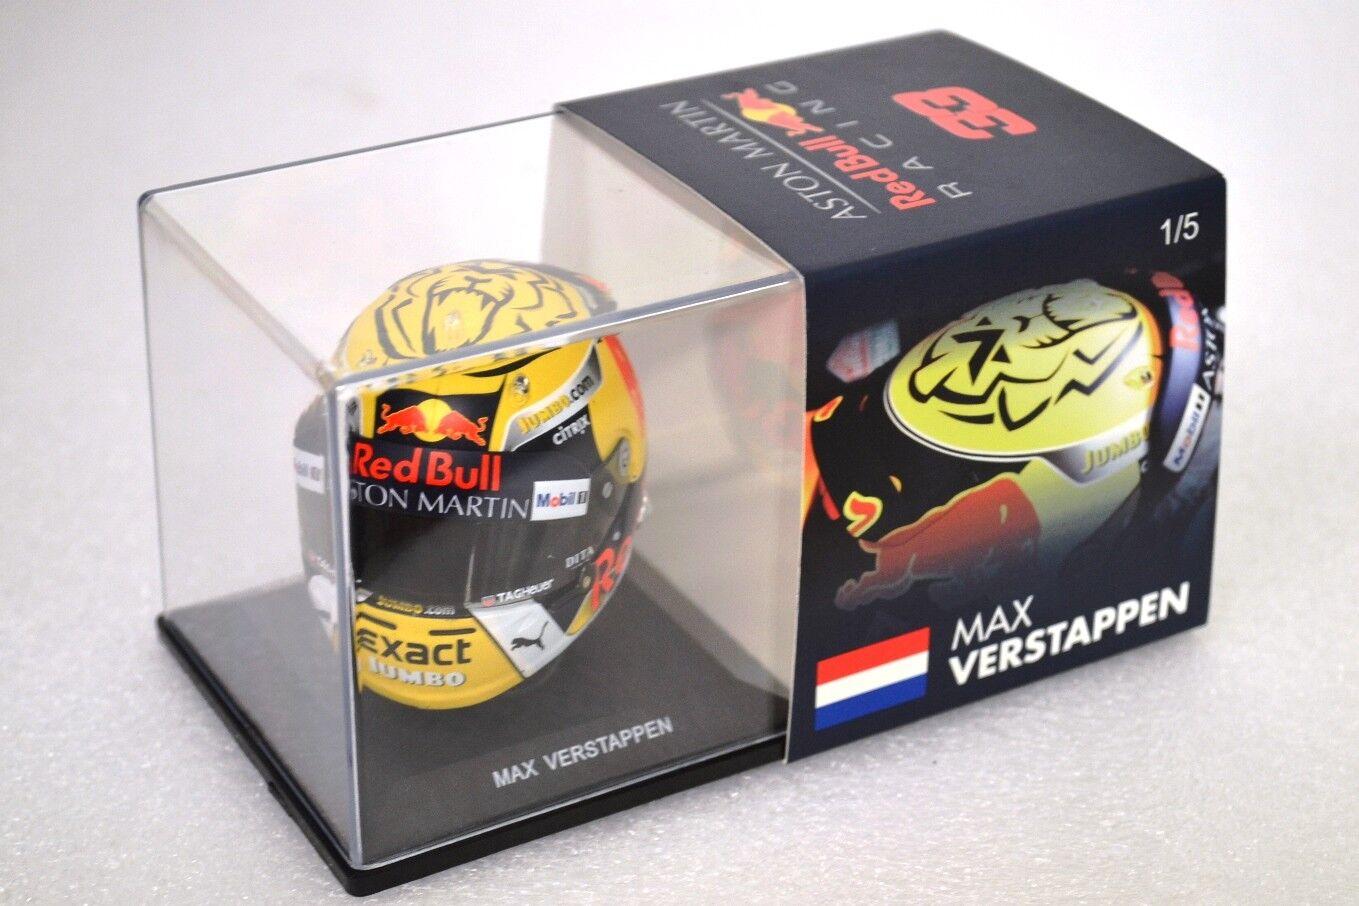 Max Verstappen rosso Bull Helmet 1/5 Austrian Grand Prix 2018 Season no 1/8 no 1/2